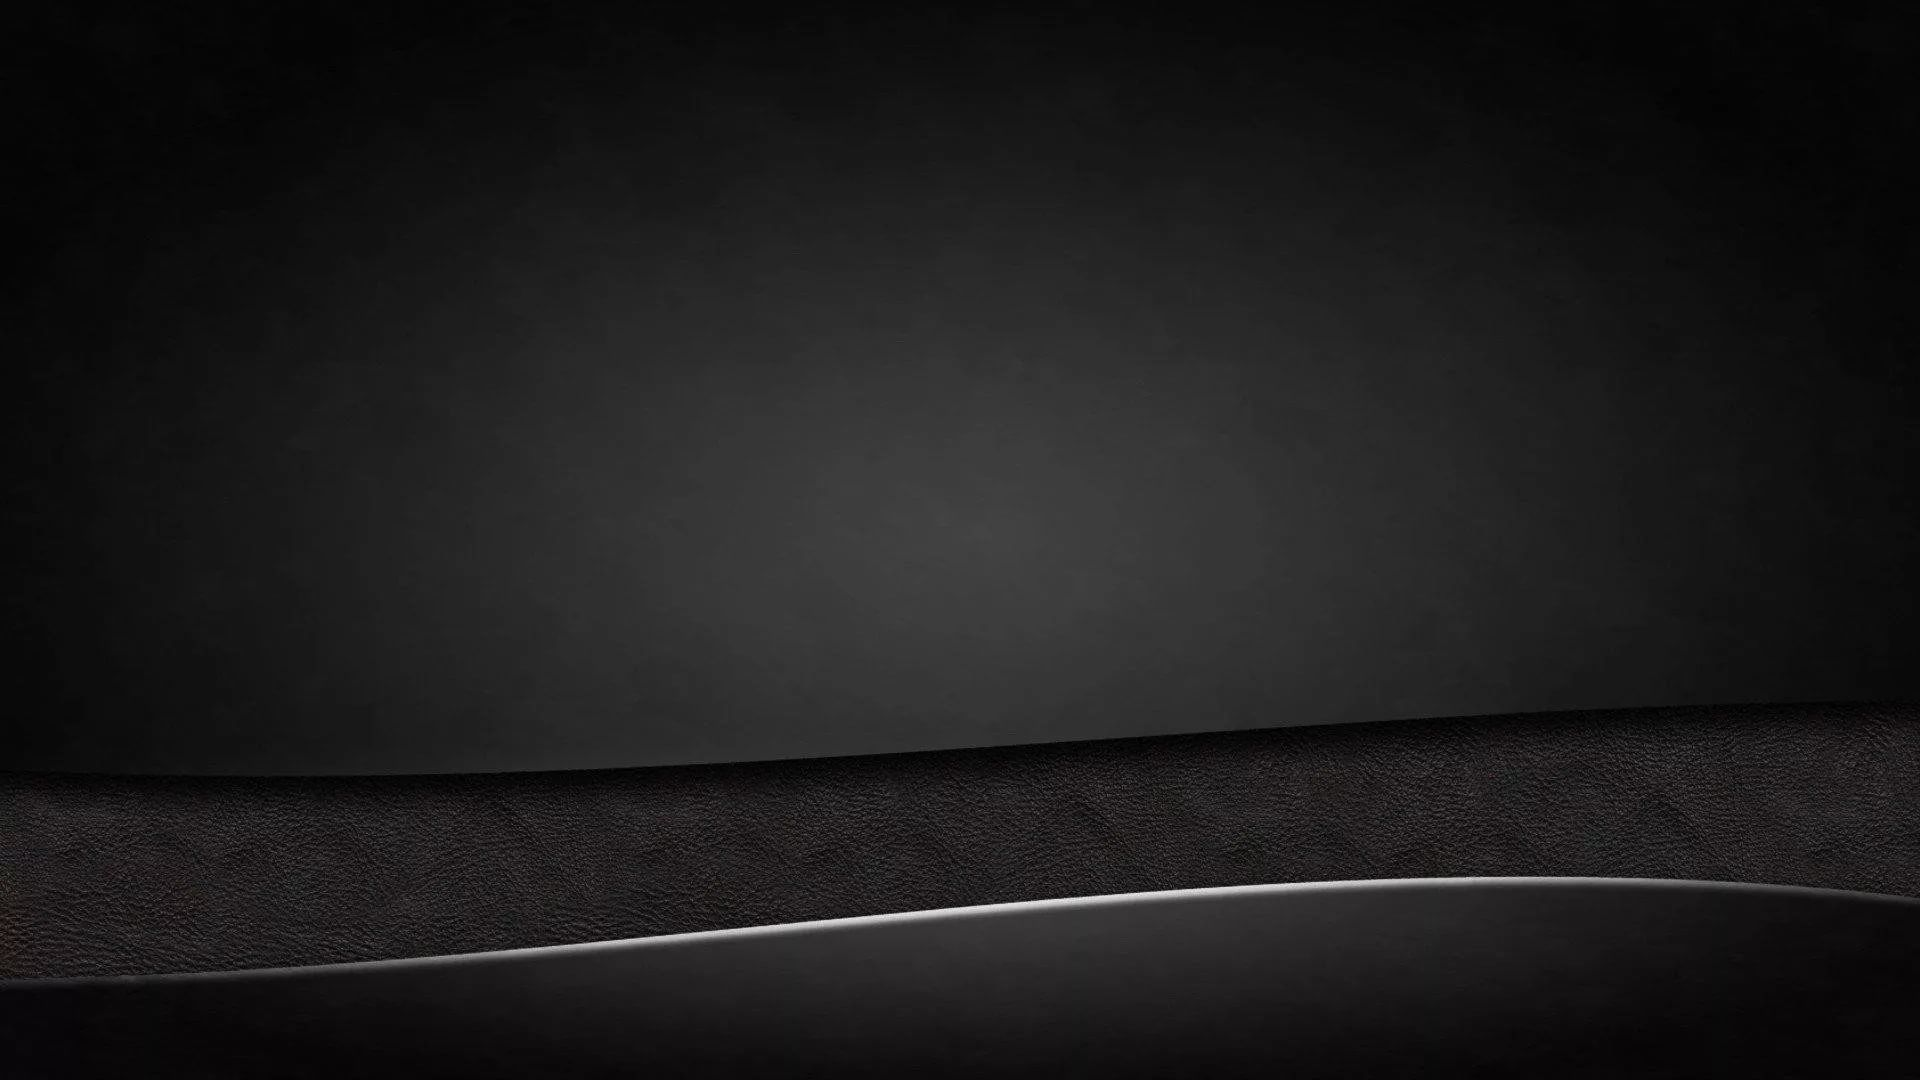 Plain Black PC Wallpaper